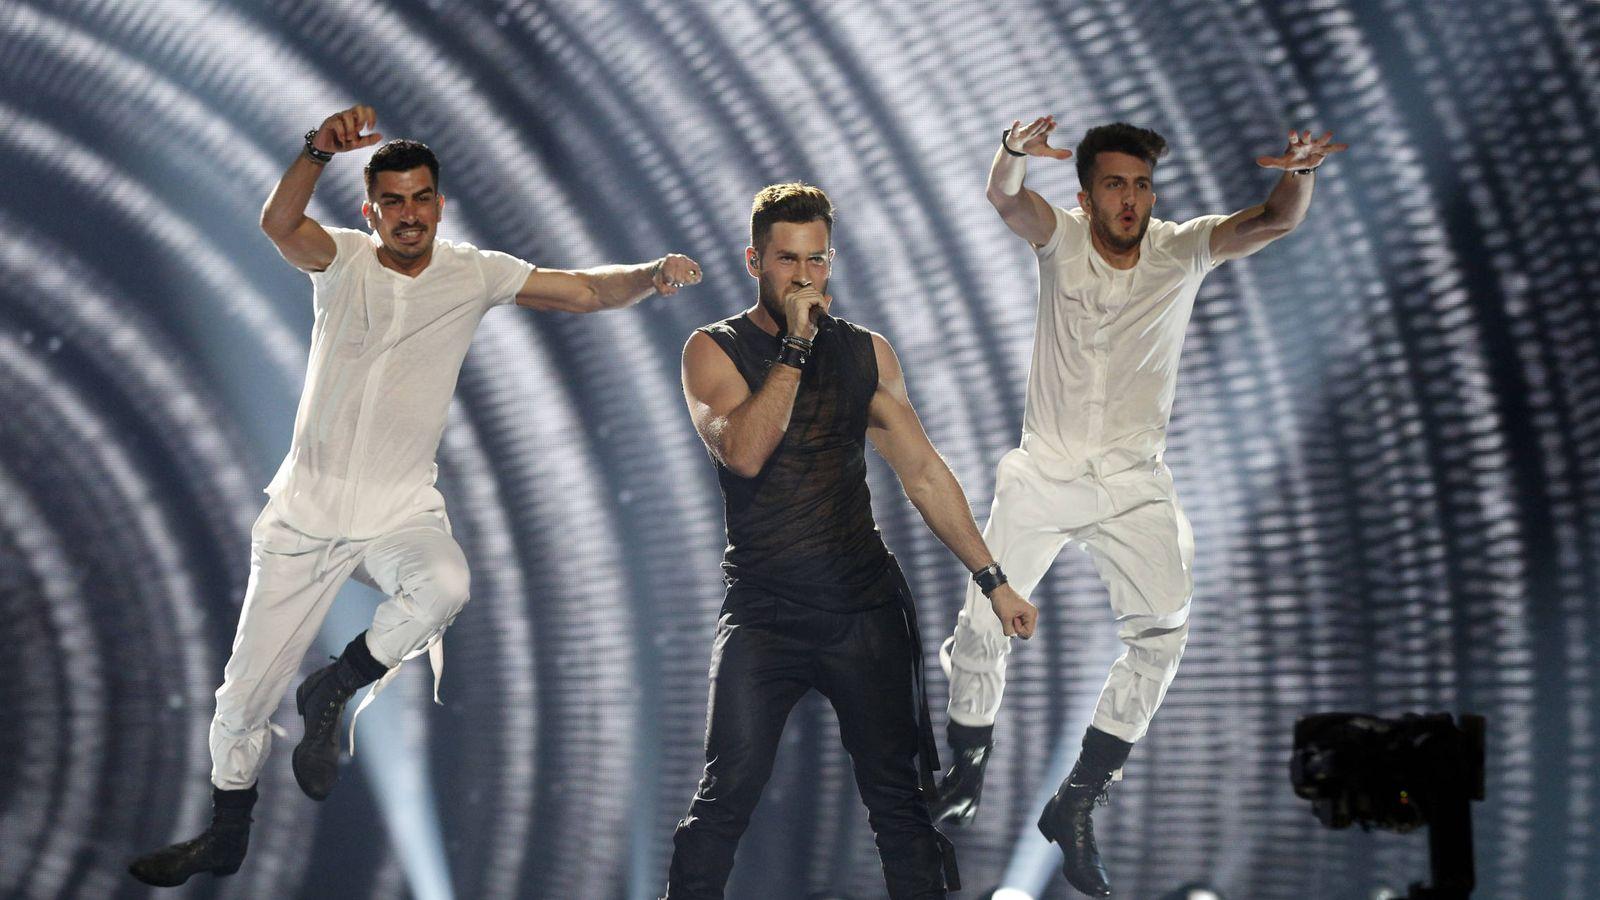 Foto: Actuación de IMRI, representante de Israel en Eurovisión. (GTRES)